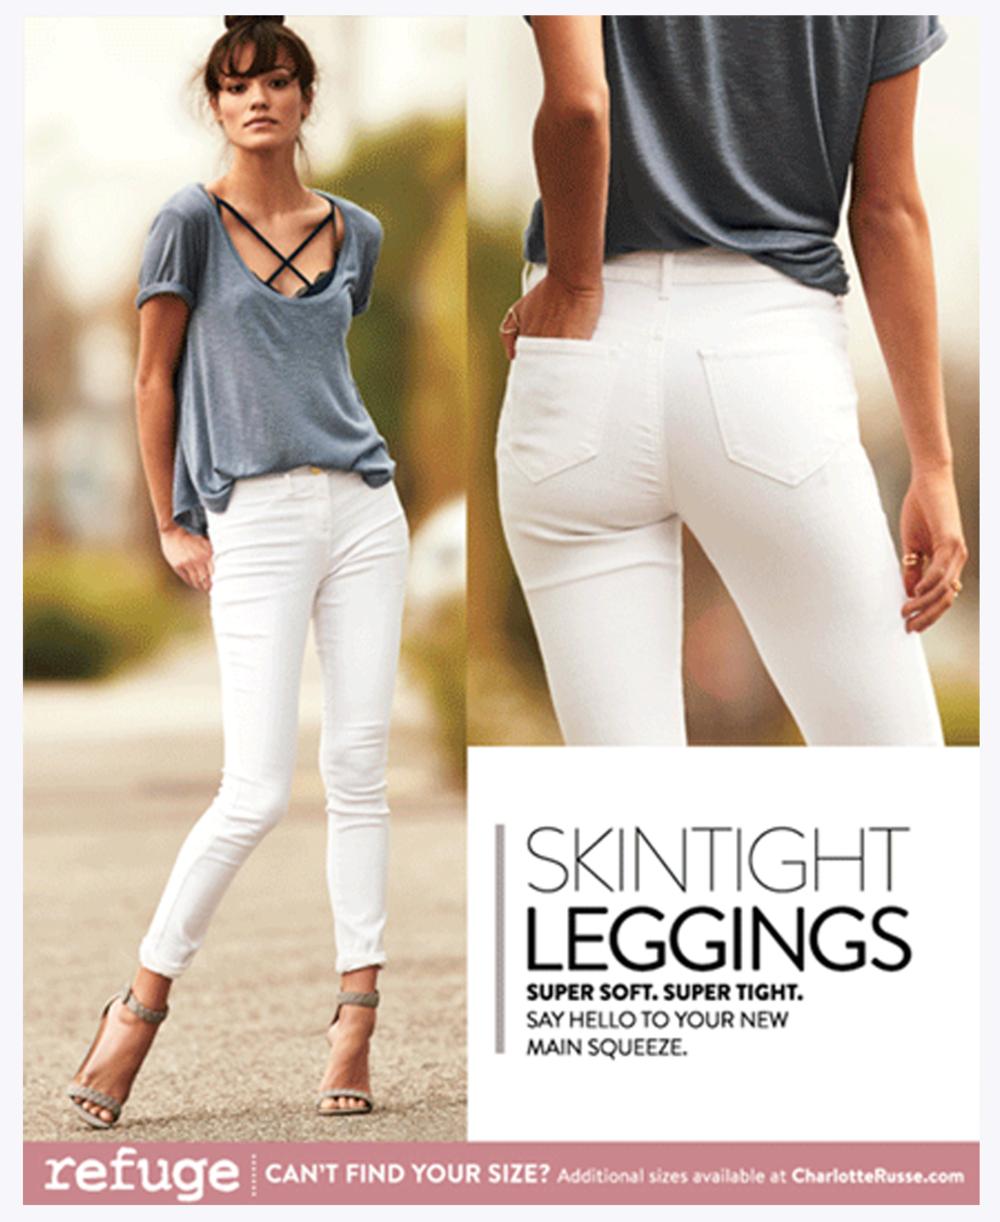 skintight leggings.png